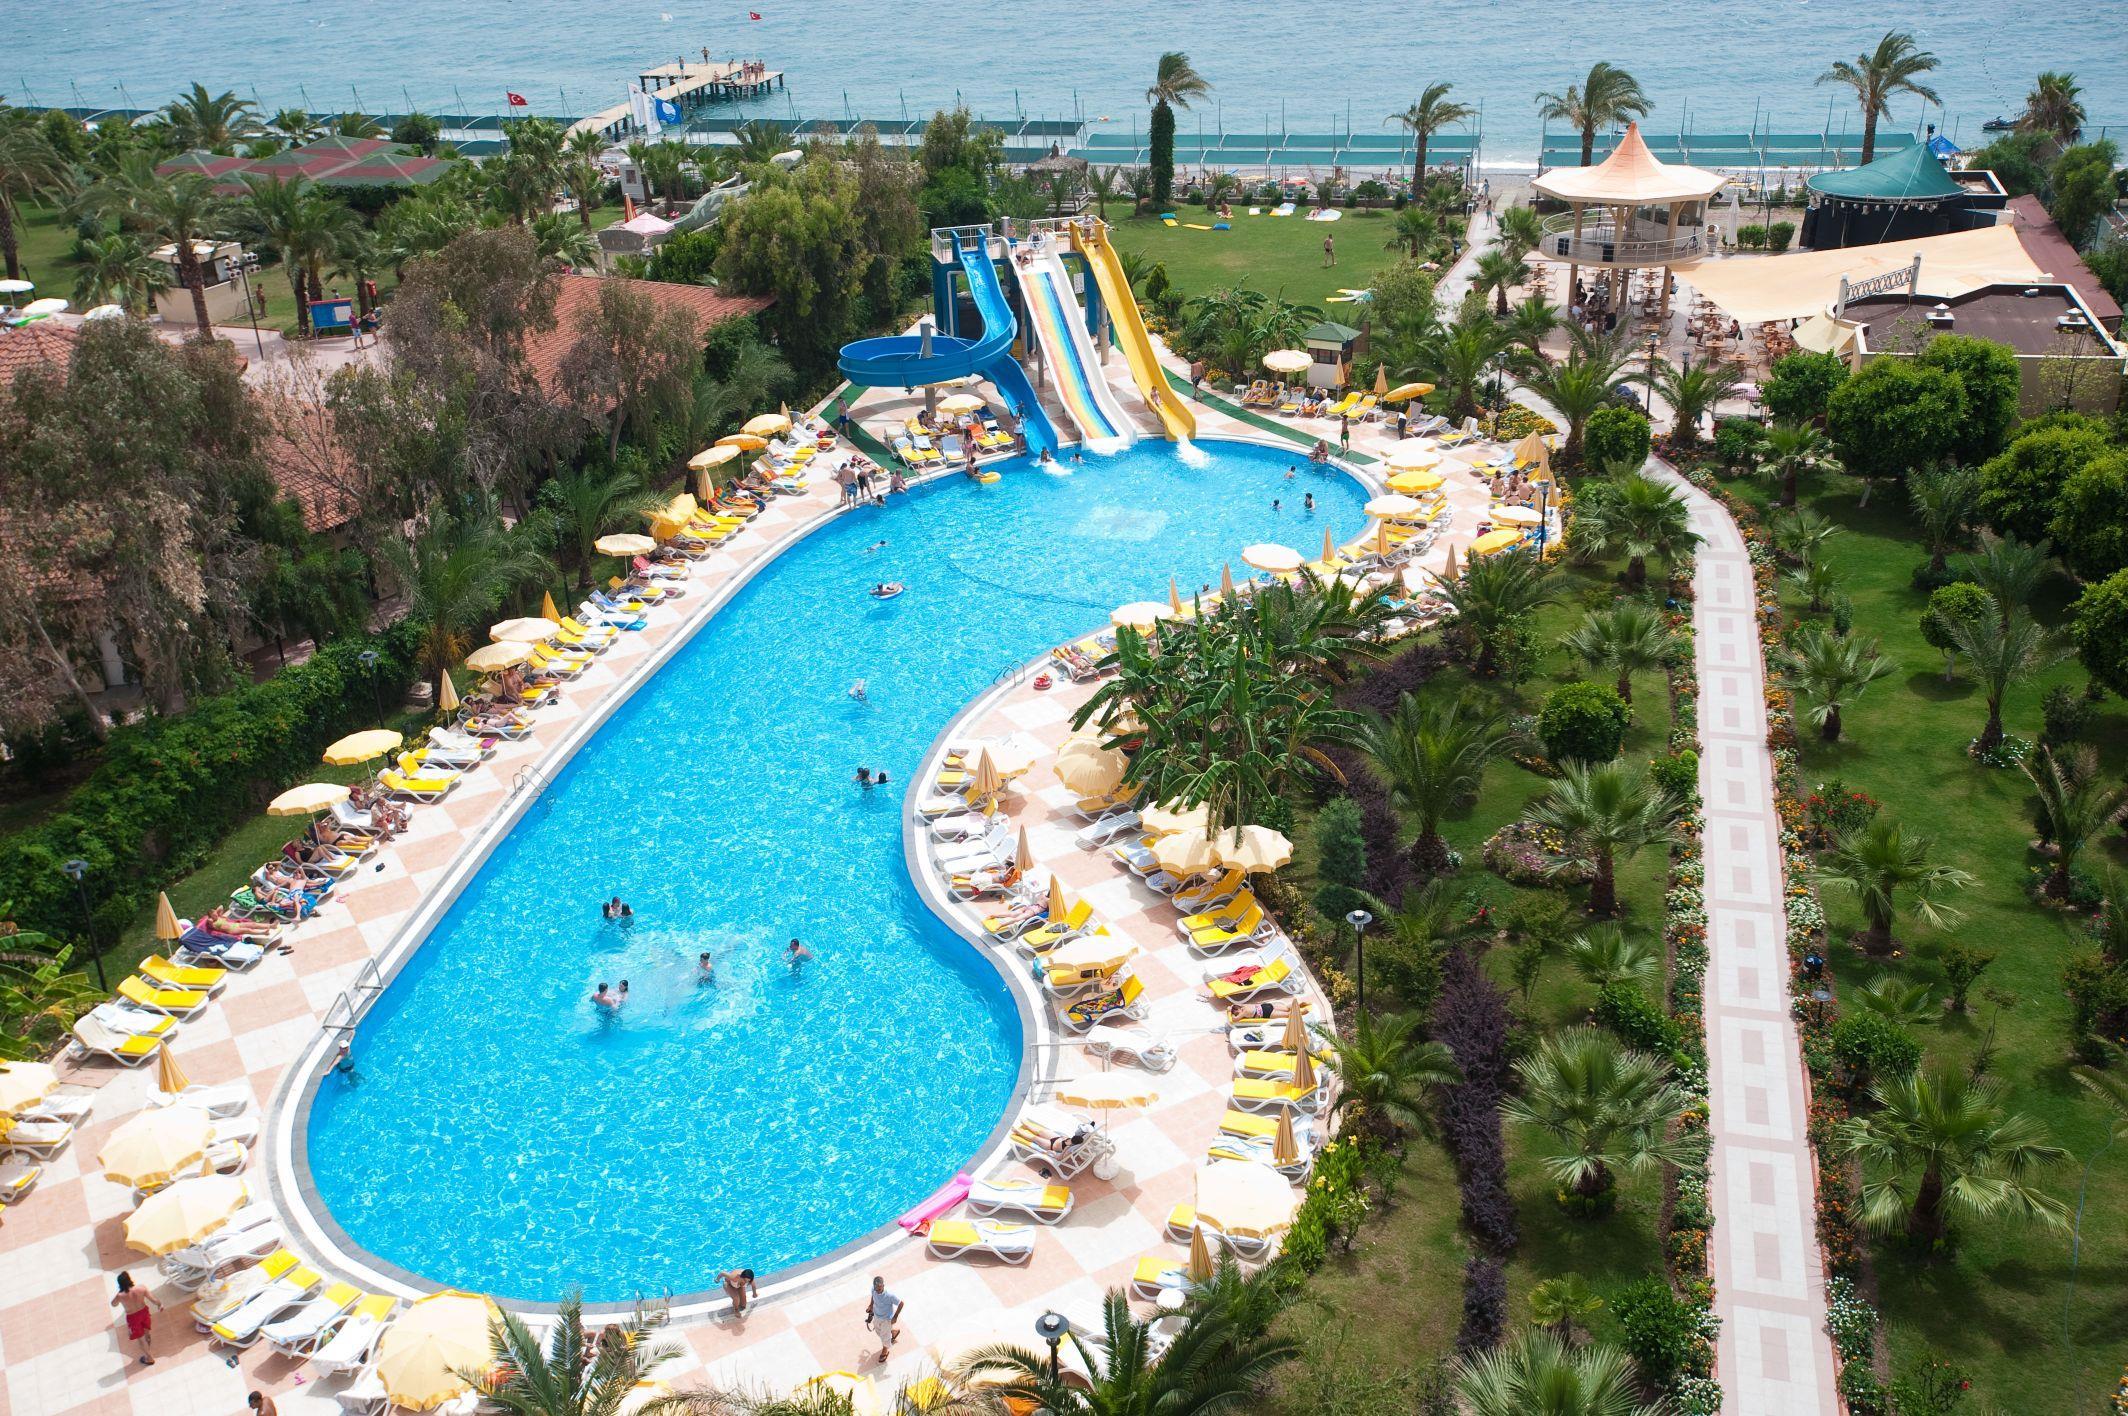 http://www.orextravel.sk/OREX/hotelphotos/stella-beach-hotel-alanya-general-0030.jpg